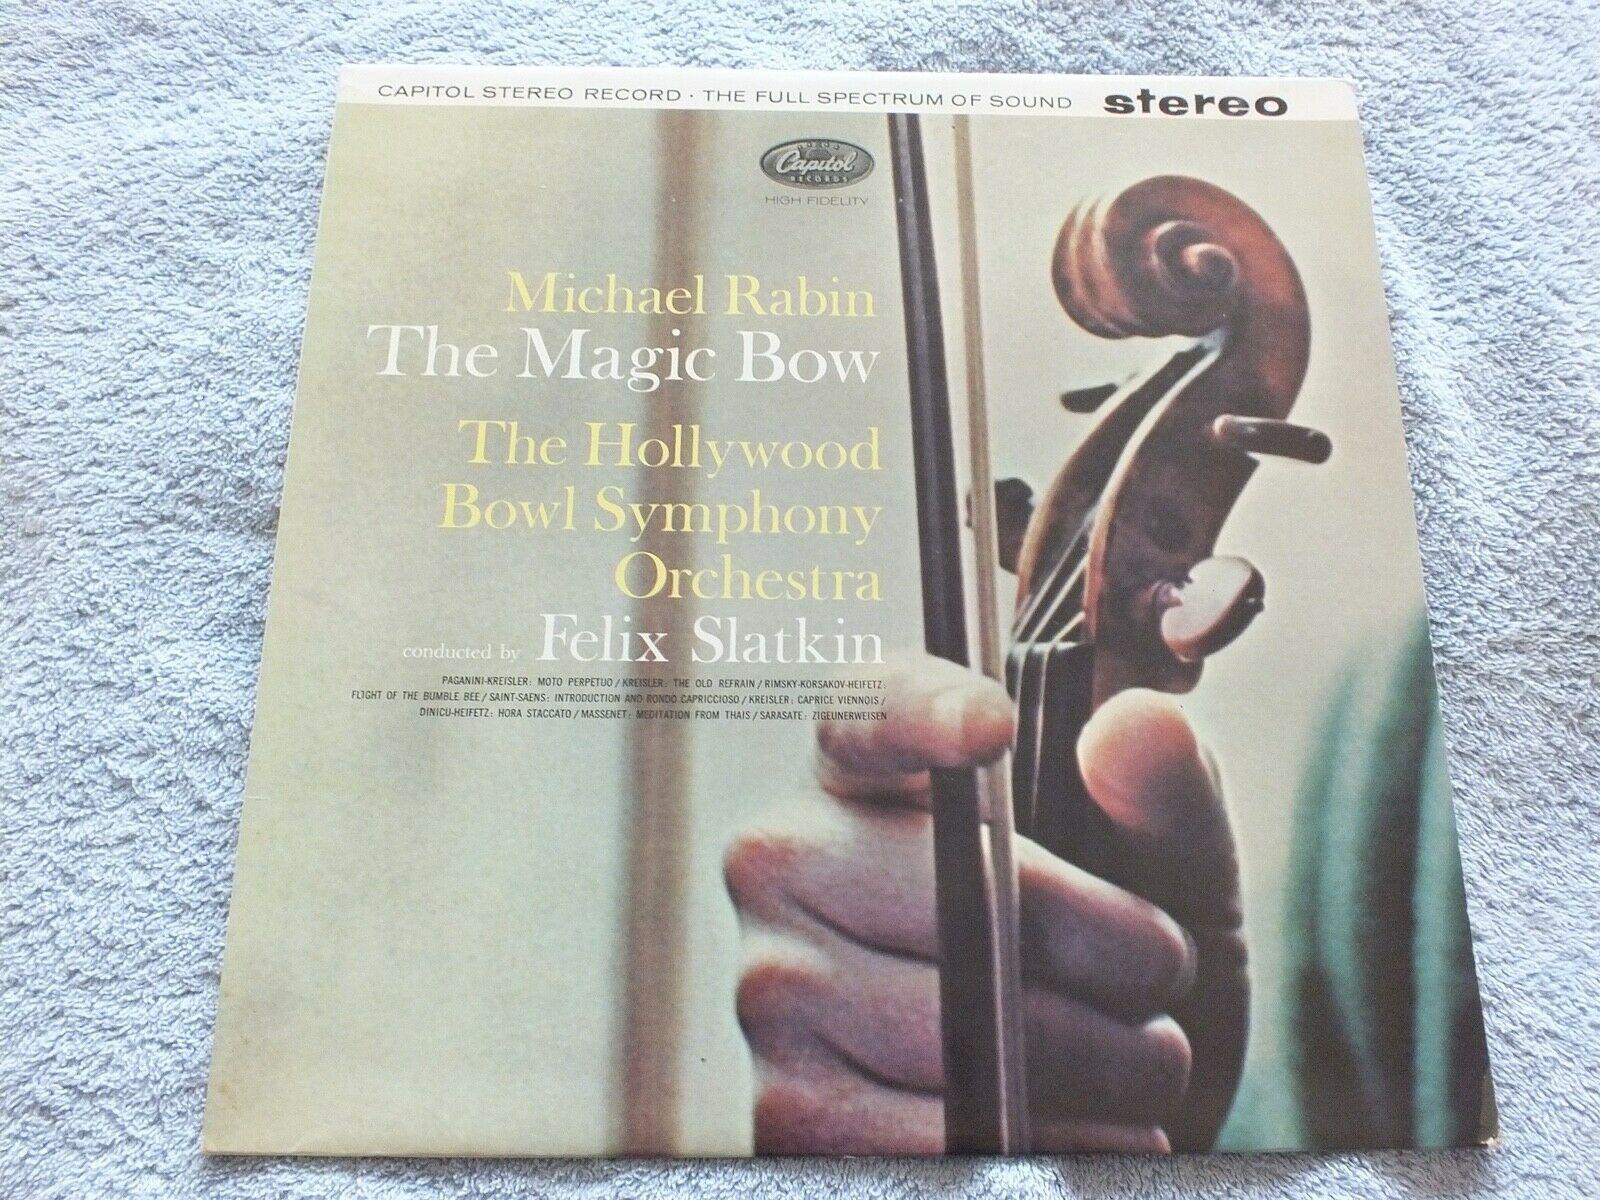 Michael Rabin  The Magic Bow   1st UK Capitol   Rare Stereo LP NM  EX   Listen